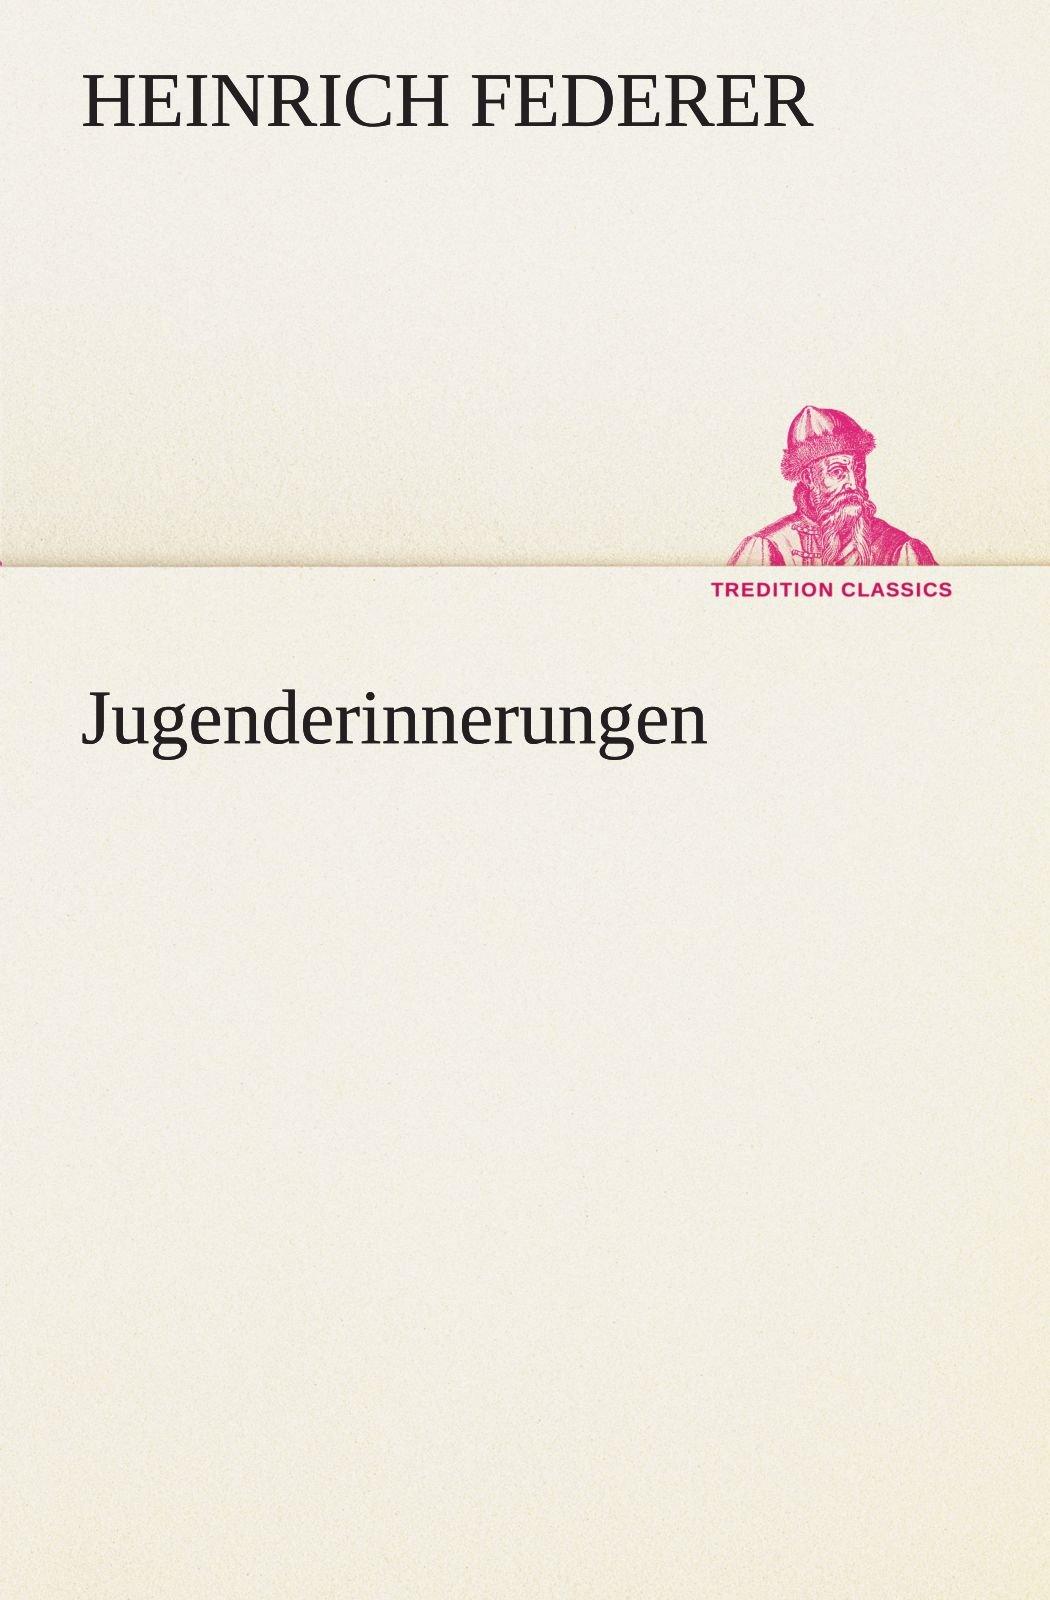 Download Jugenderinnerungen (TREDITION CLASSICS) (German Edition) PDF